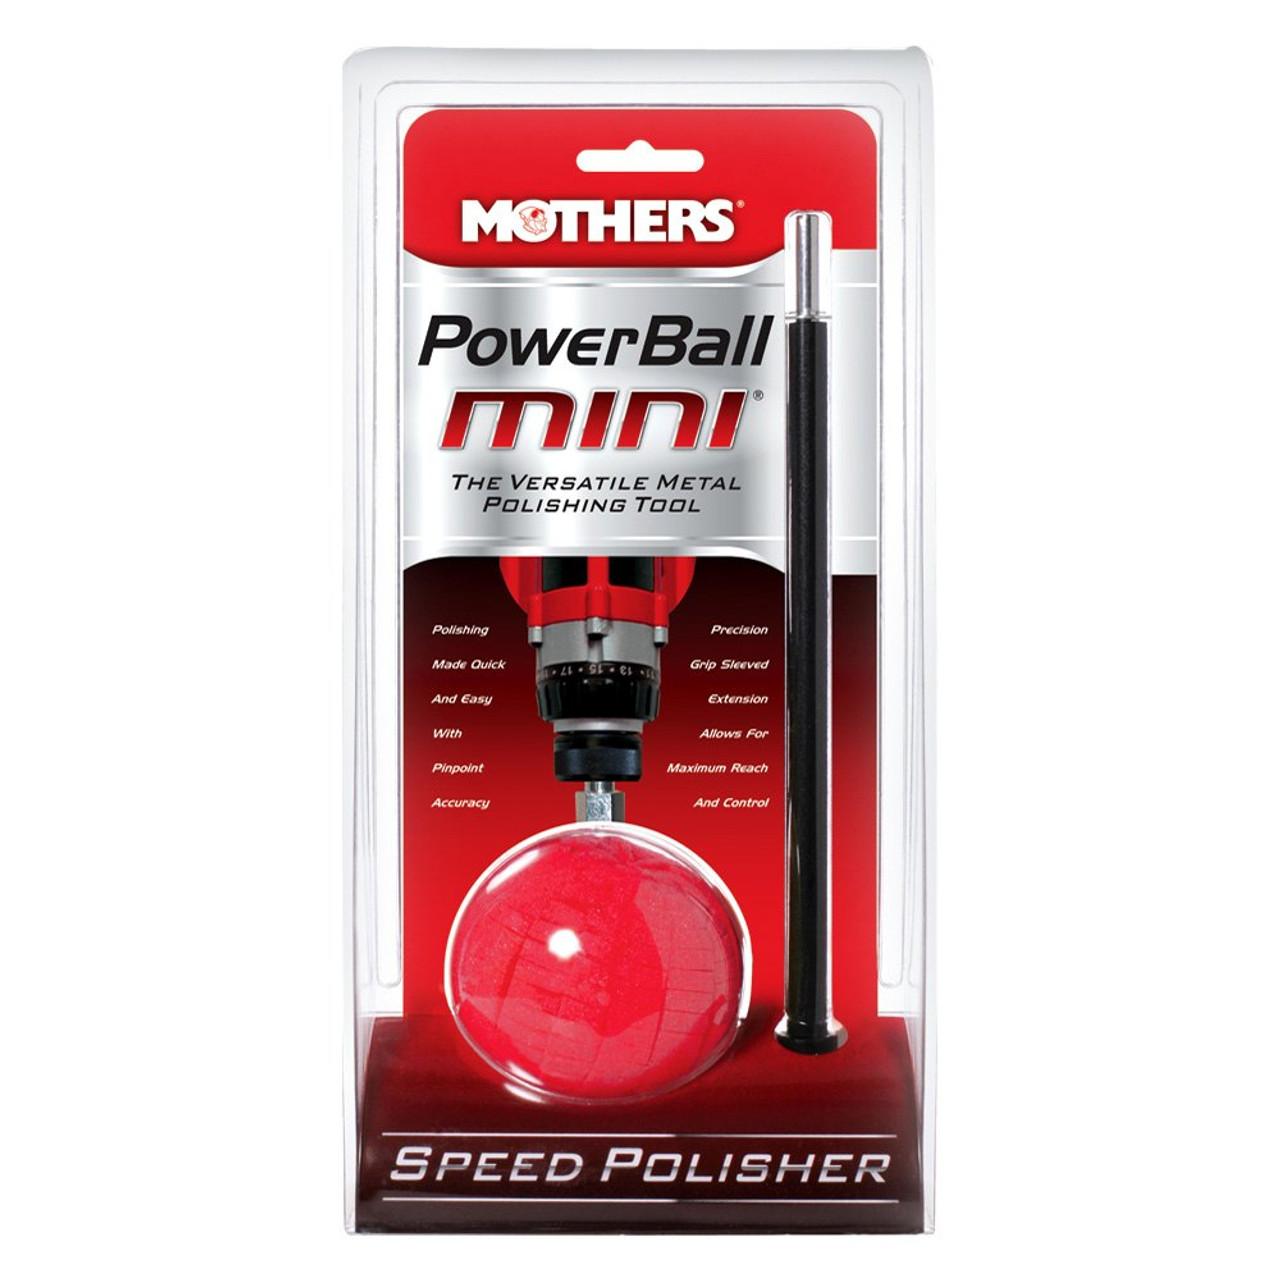 MTH05141, POWERBALL MINI POLISHING BALL